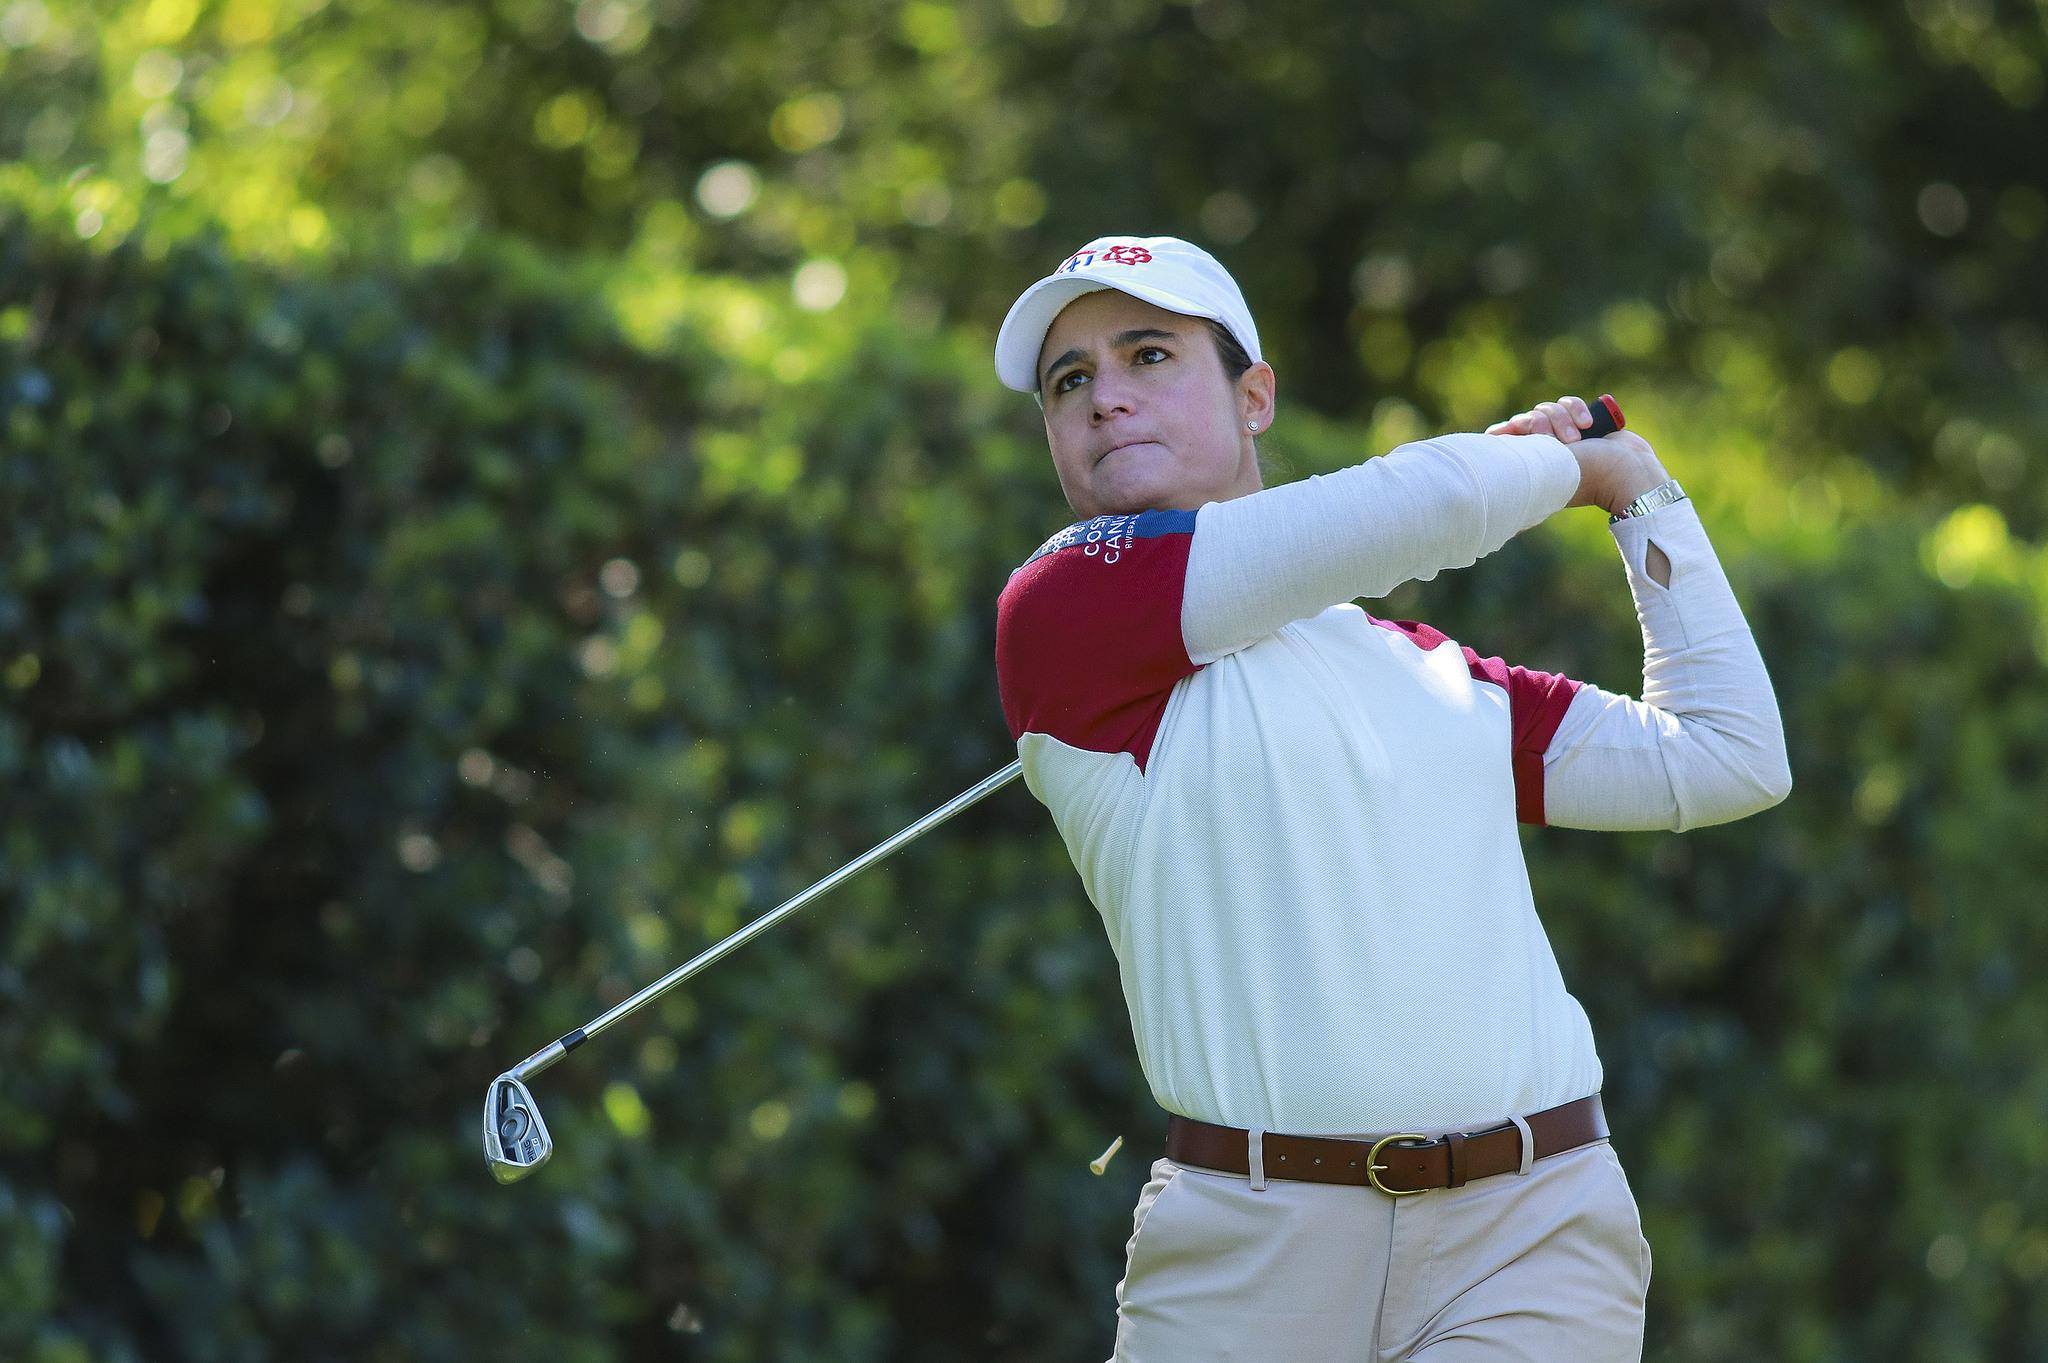 Lorena Ochoa alcanzó la cima del ranking mundial del golf